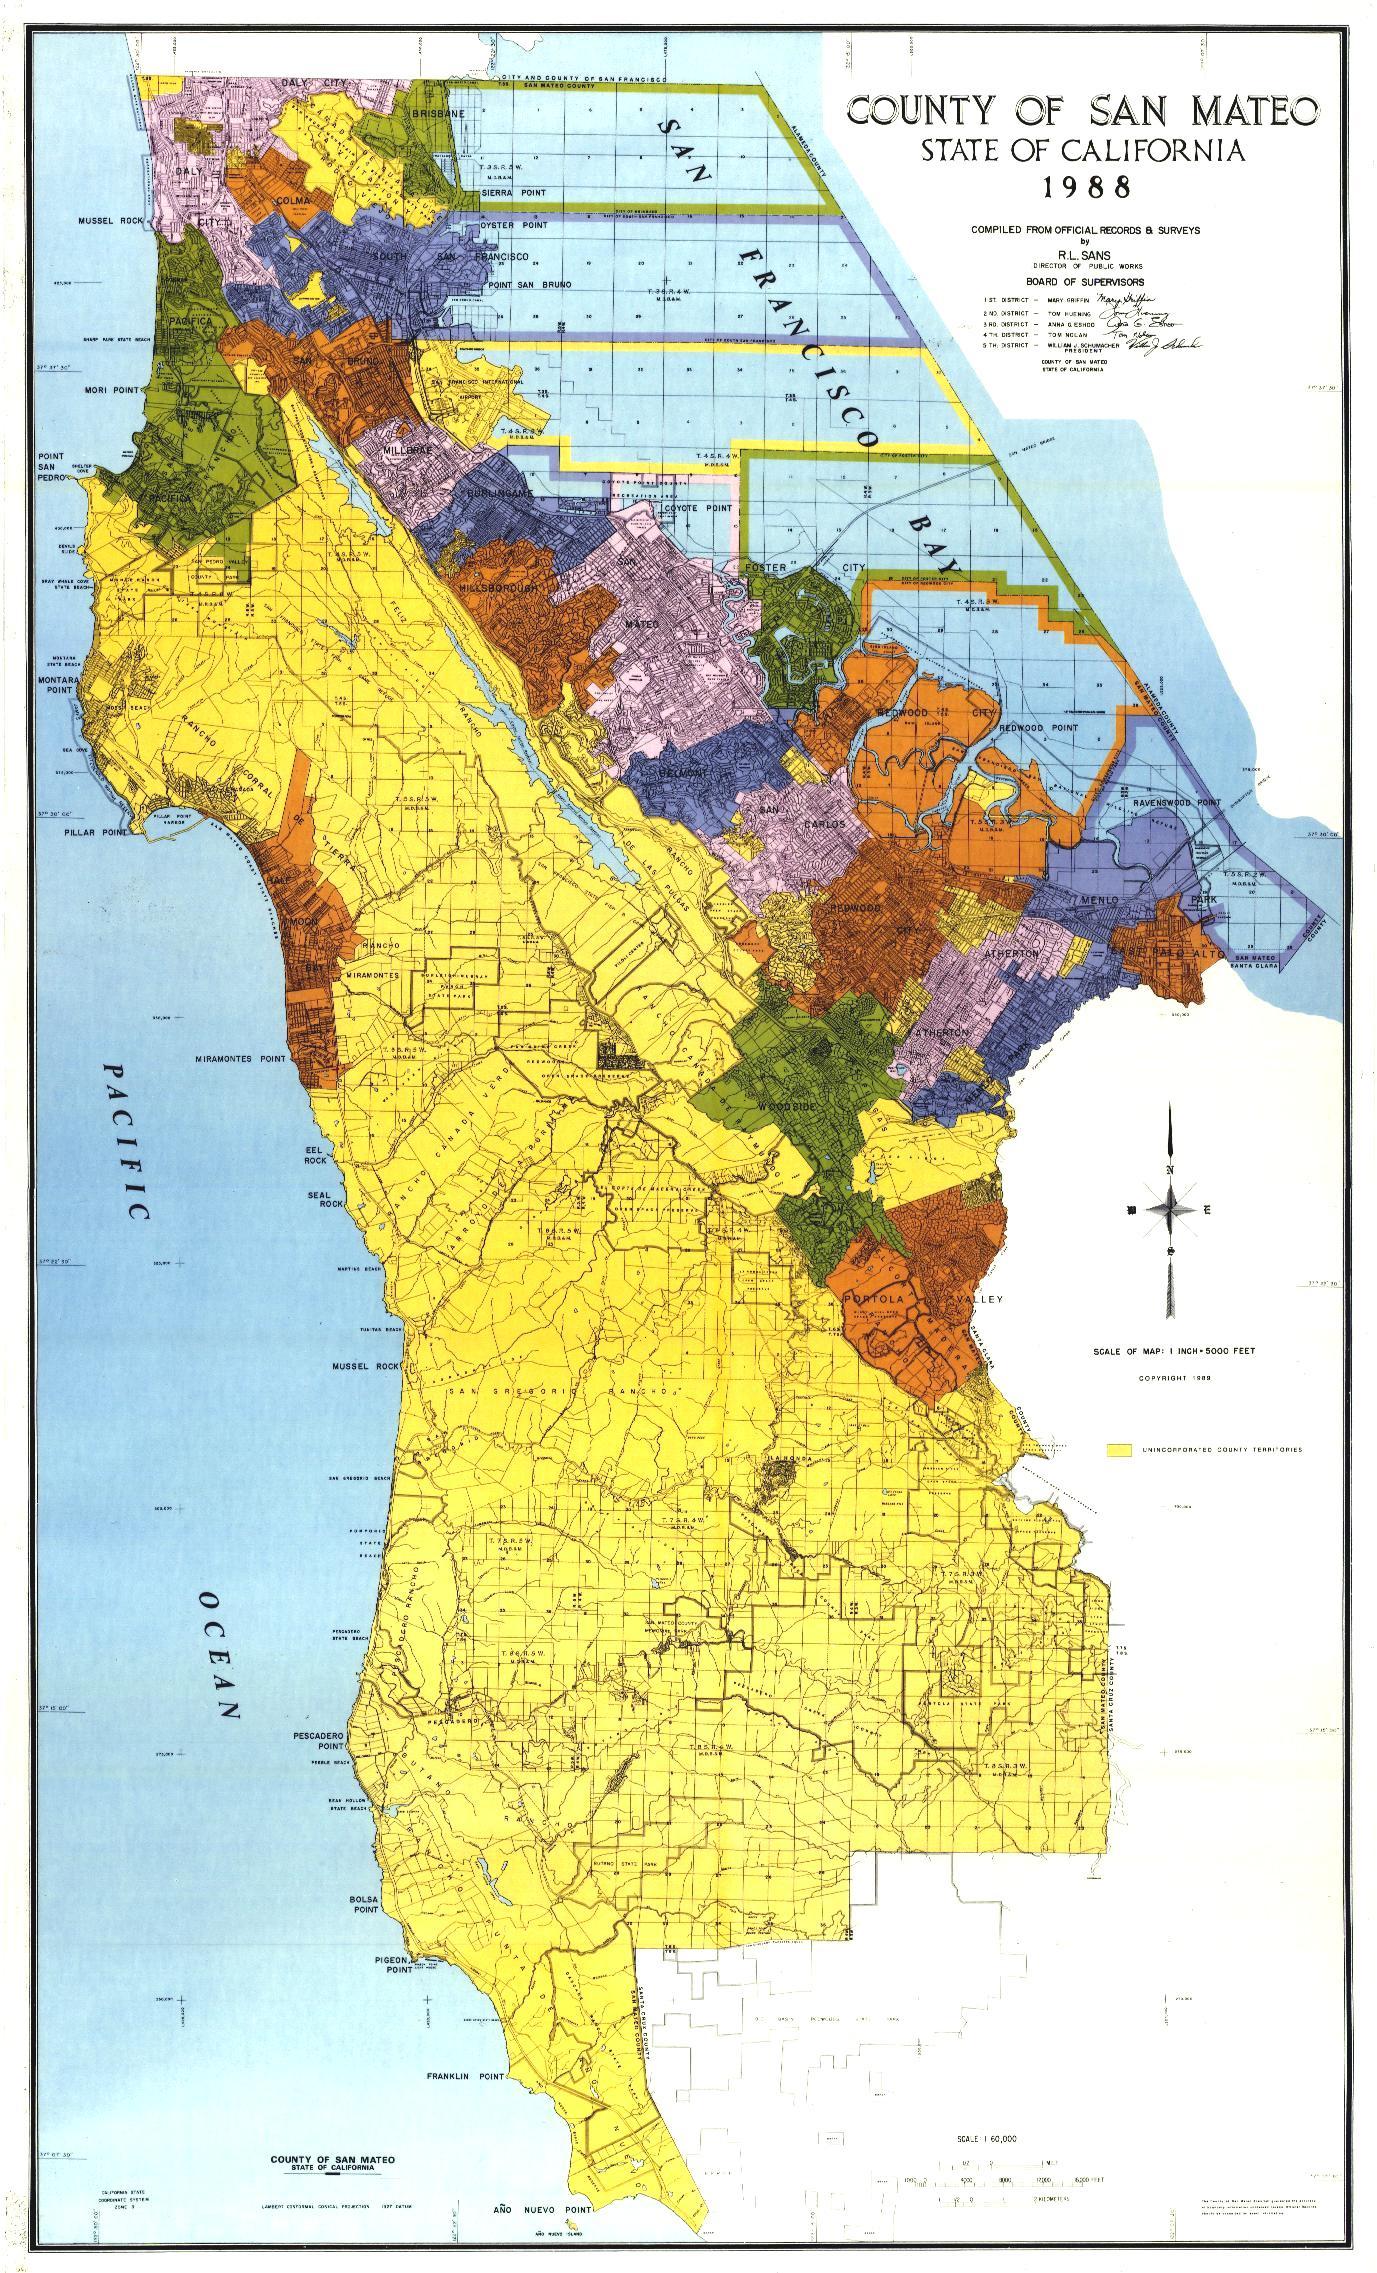 San Mateo County Map San Mateo California • mappery